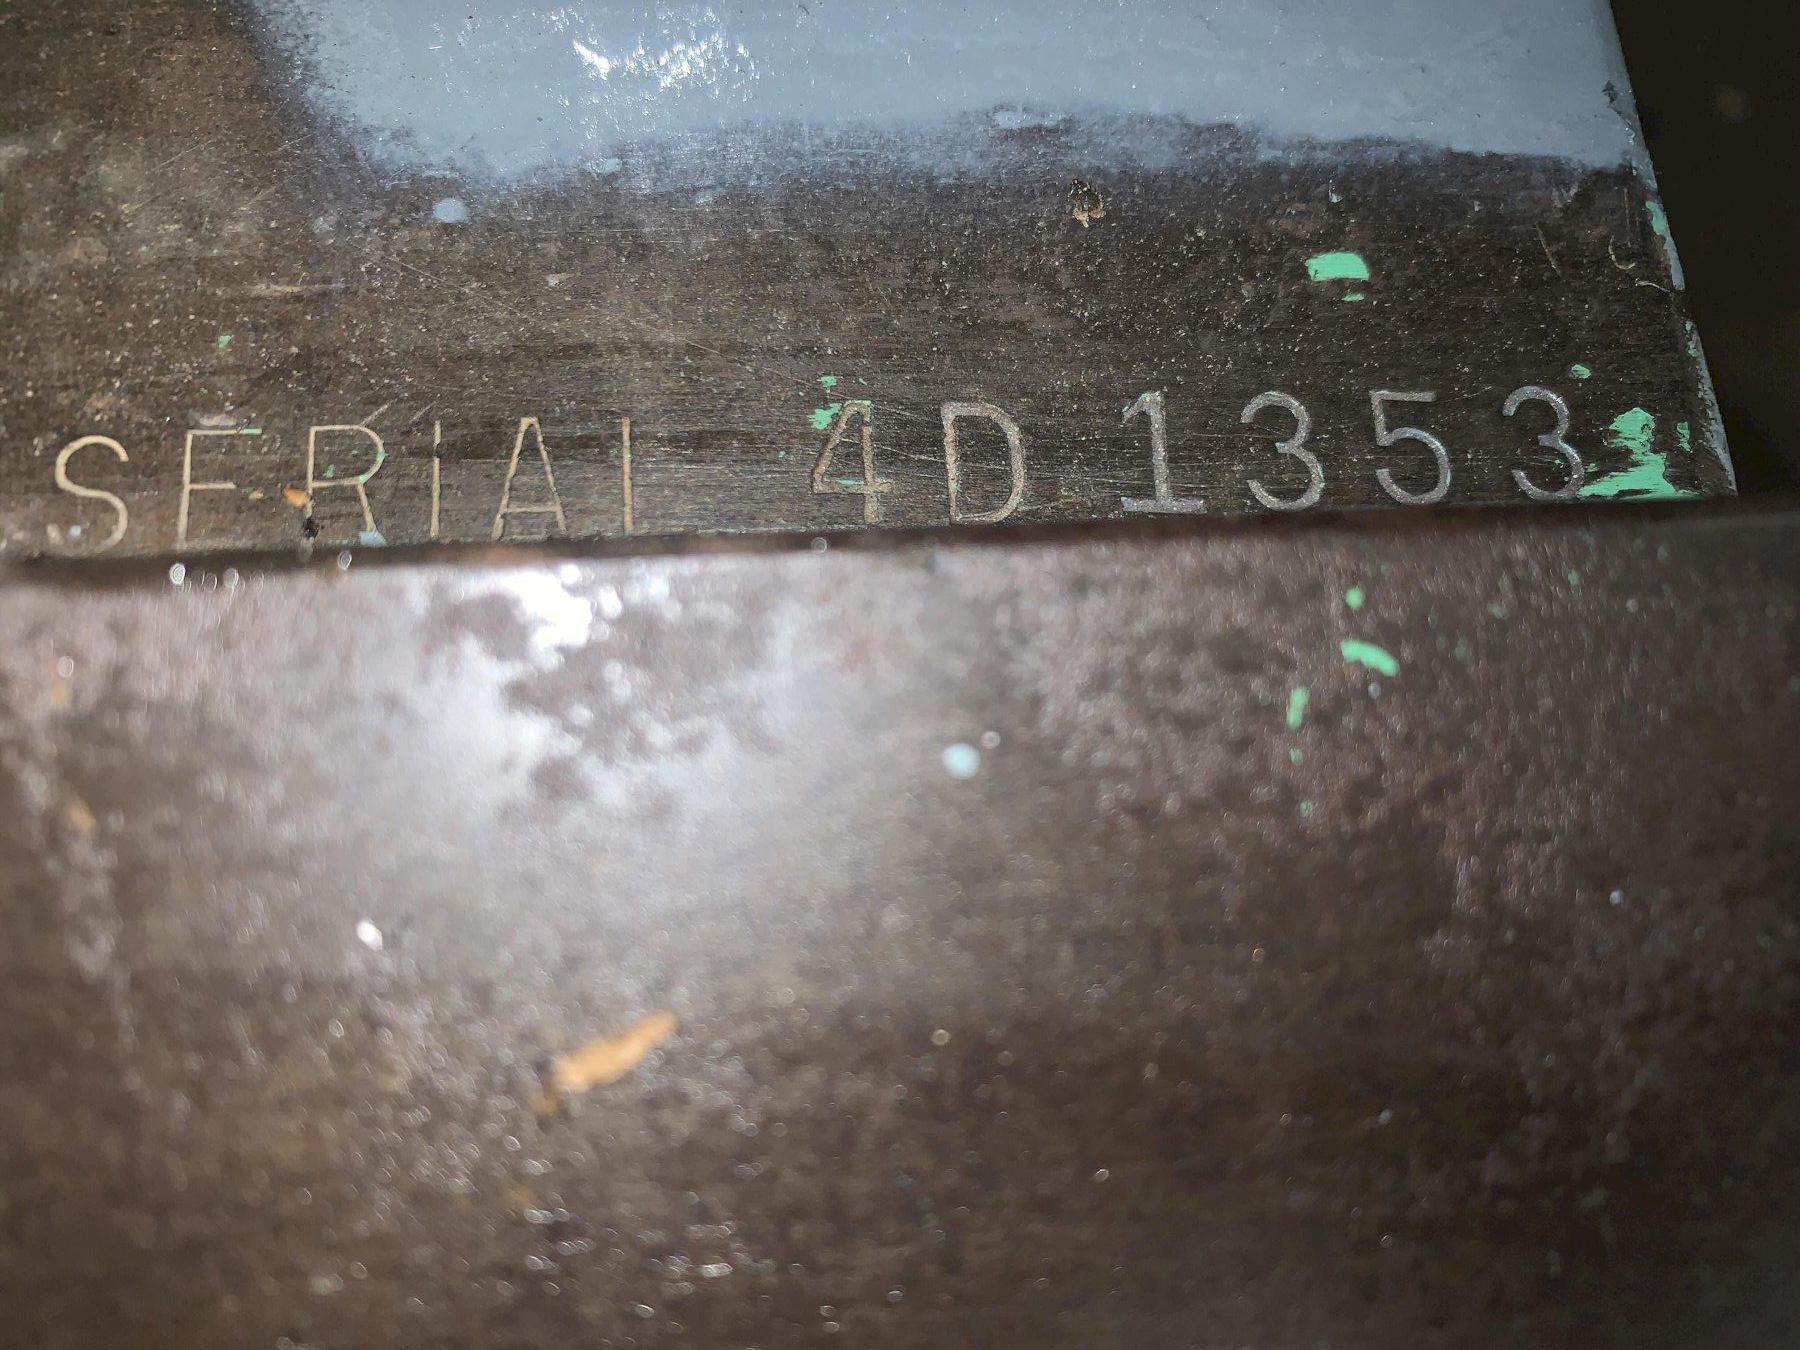 db3cdb0f881b61594f1ea8e35f109b52-a5172273f8fd2112db3b63715bd9069f.jpeg